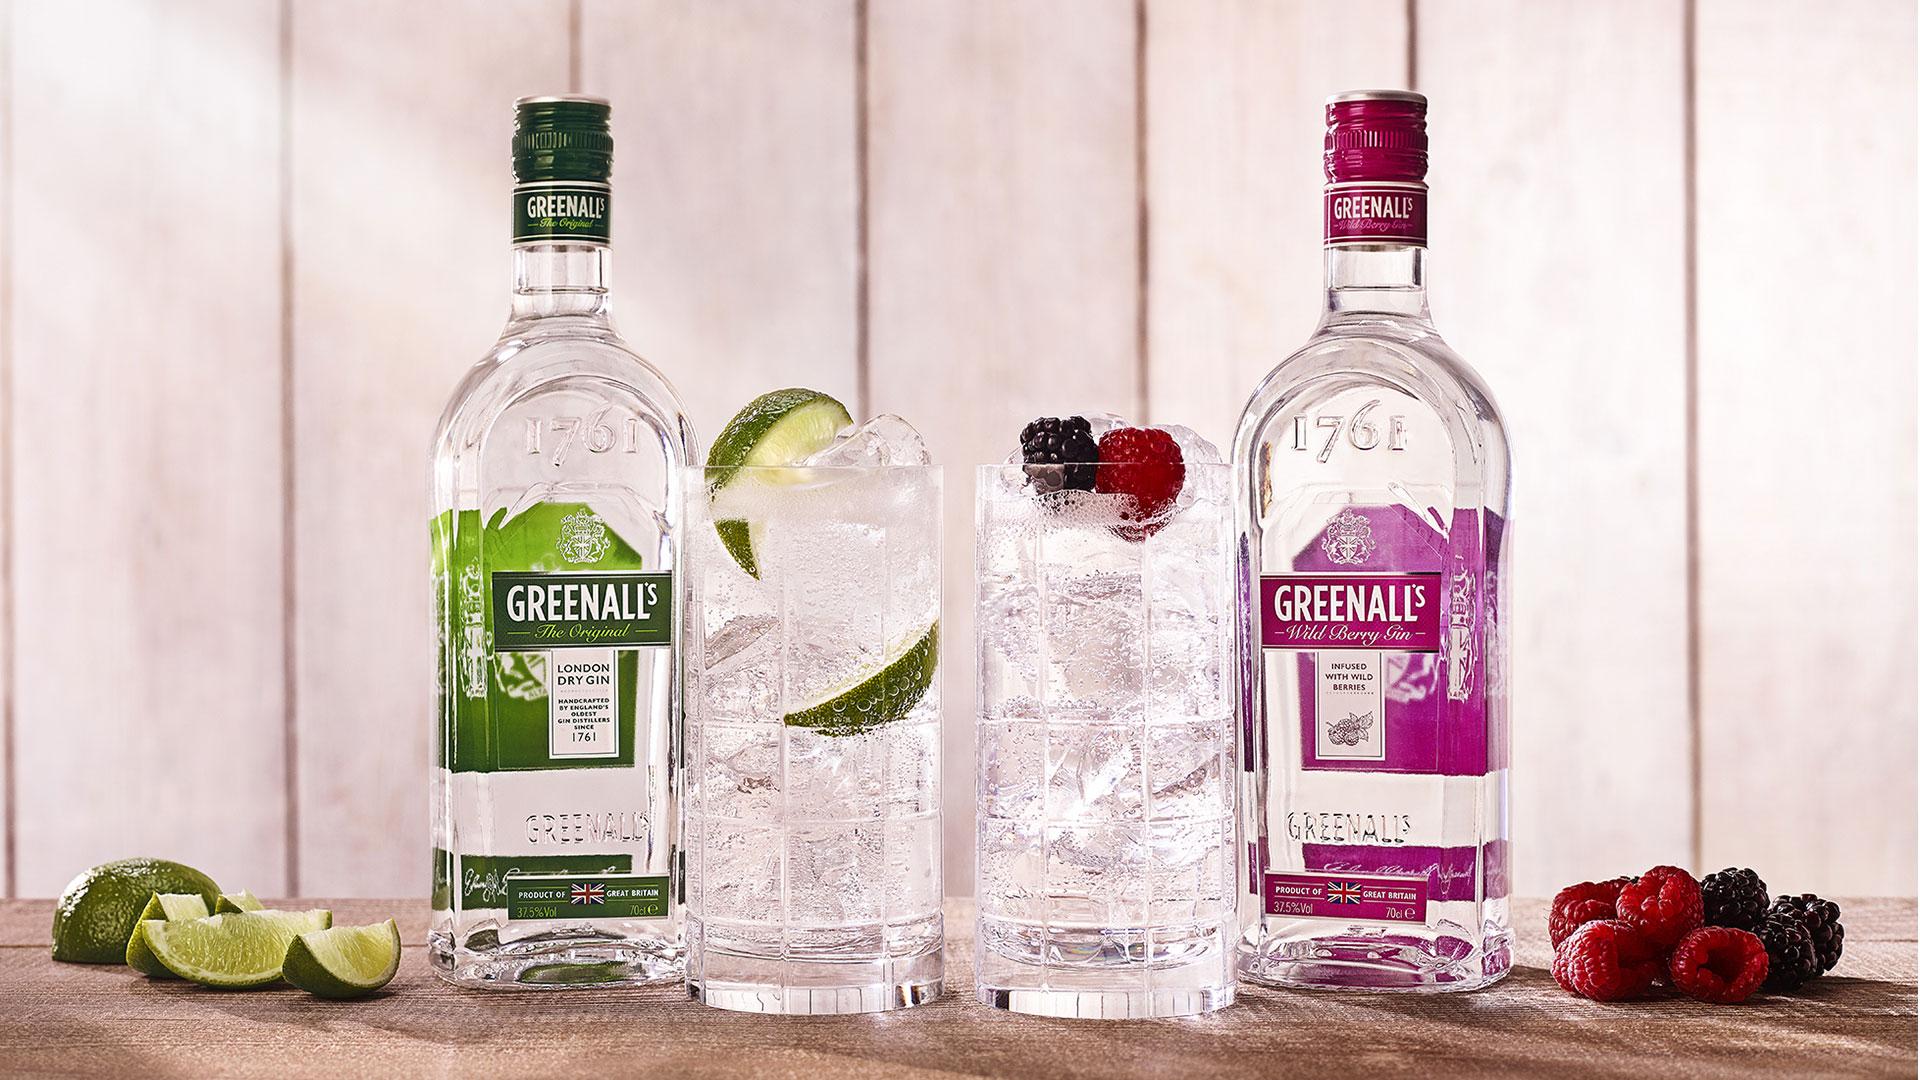 Greenall's Gin first distilled in Warrington